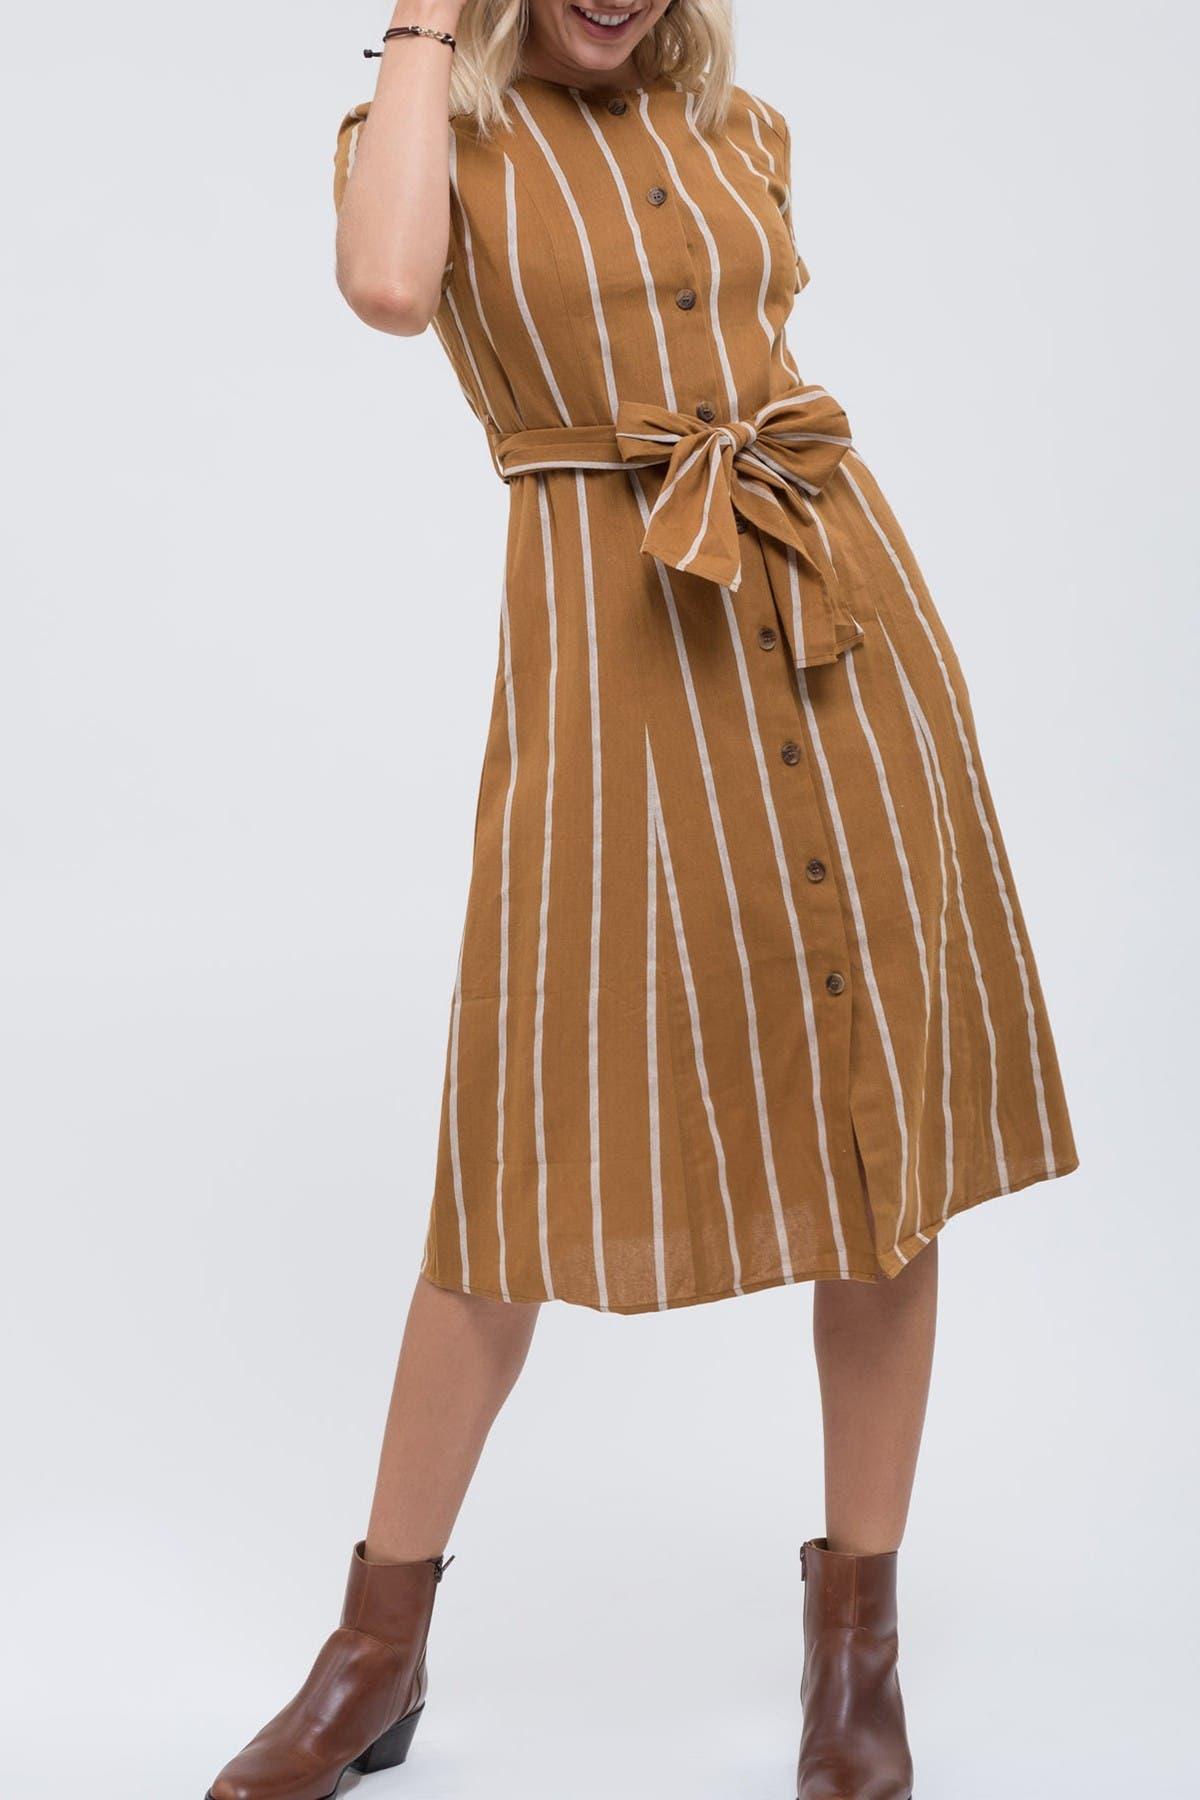 Image of Blu Pepper Short Sleeve Stripe Waist Tie Dress